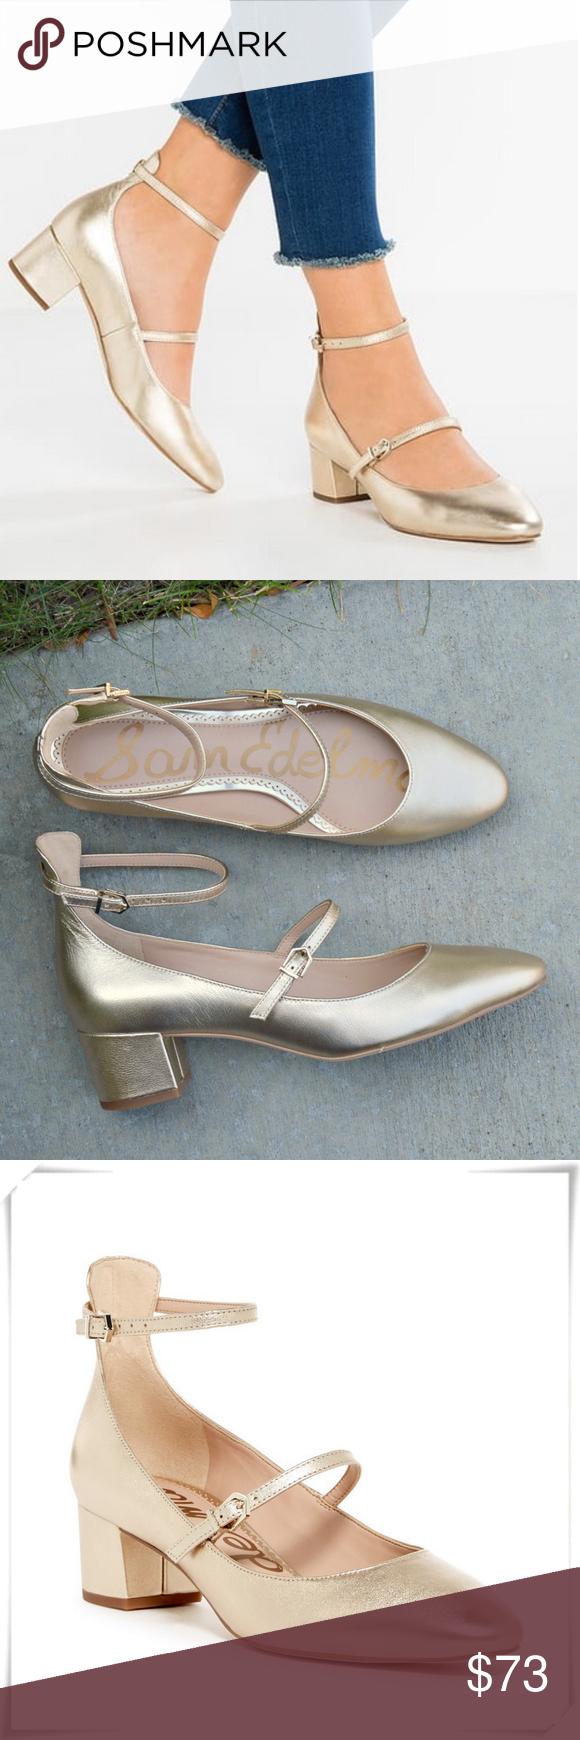 33eedb40a Sam Edelman Lulie ankle strap gold shoes heels Pretty dress shoes. Almond  toe. Metallic